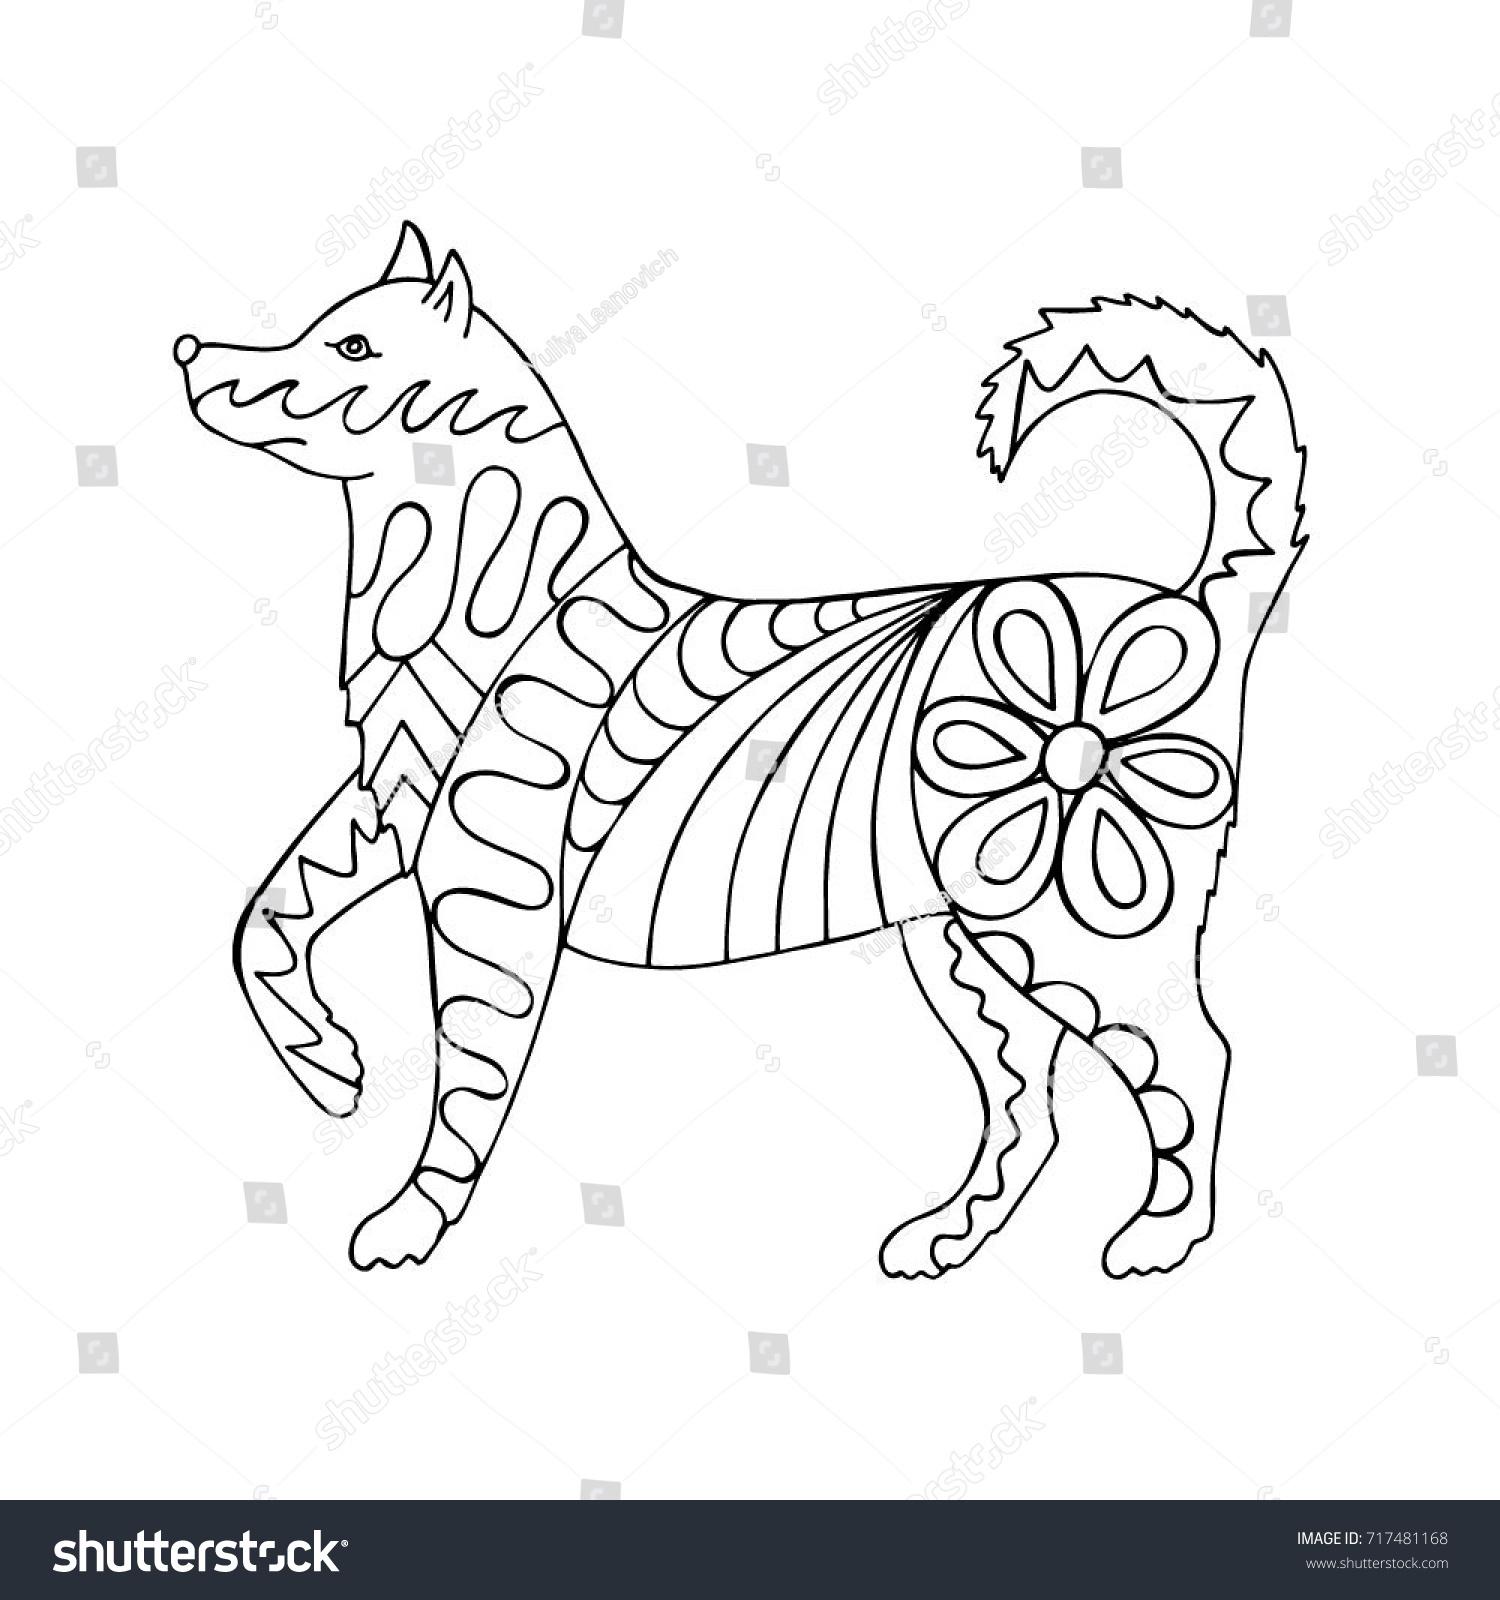 Doodle dog chinese zodiac symbol 2018 stock vector 717481168 doodle dog chinese zodiac symbol 2018 vector illustration biocorpaavc